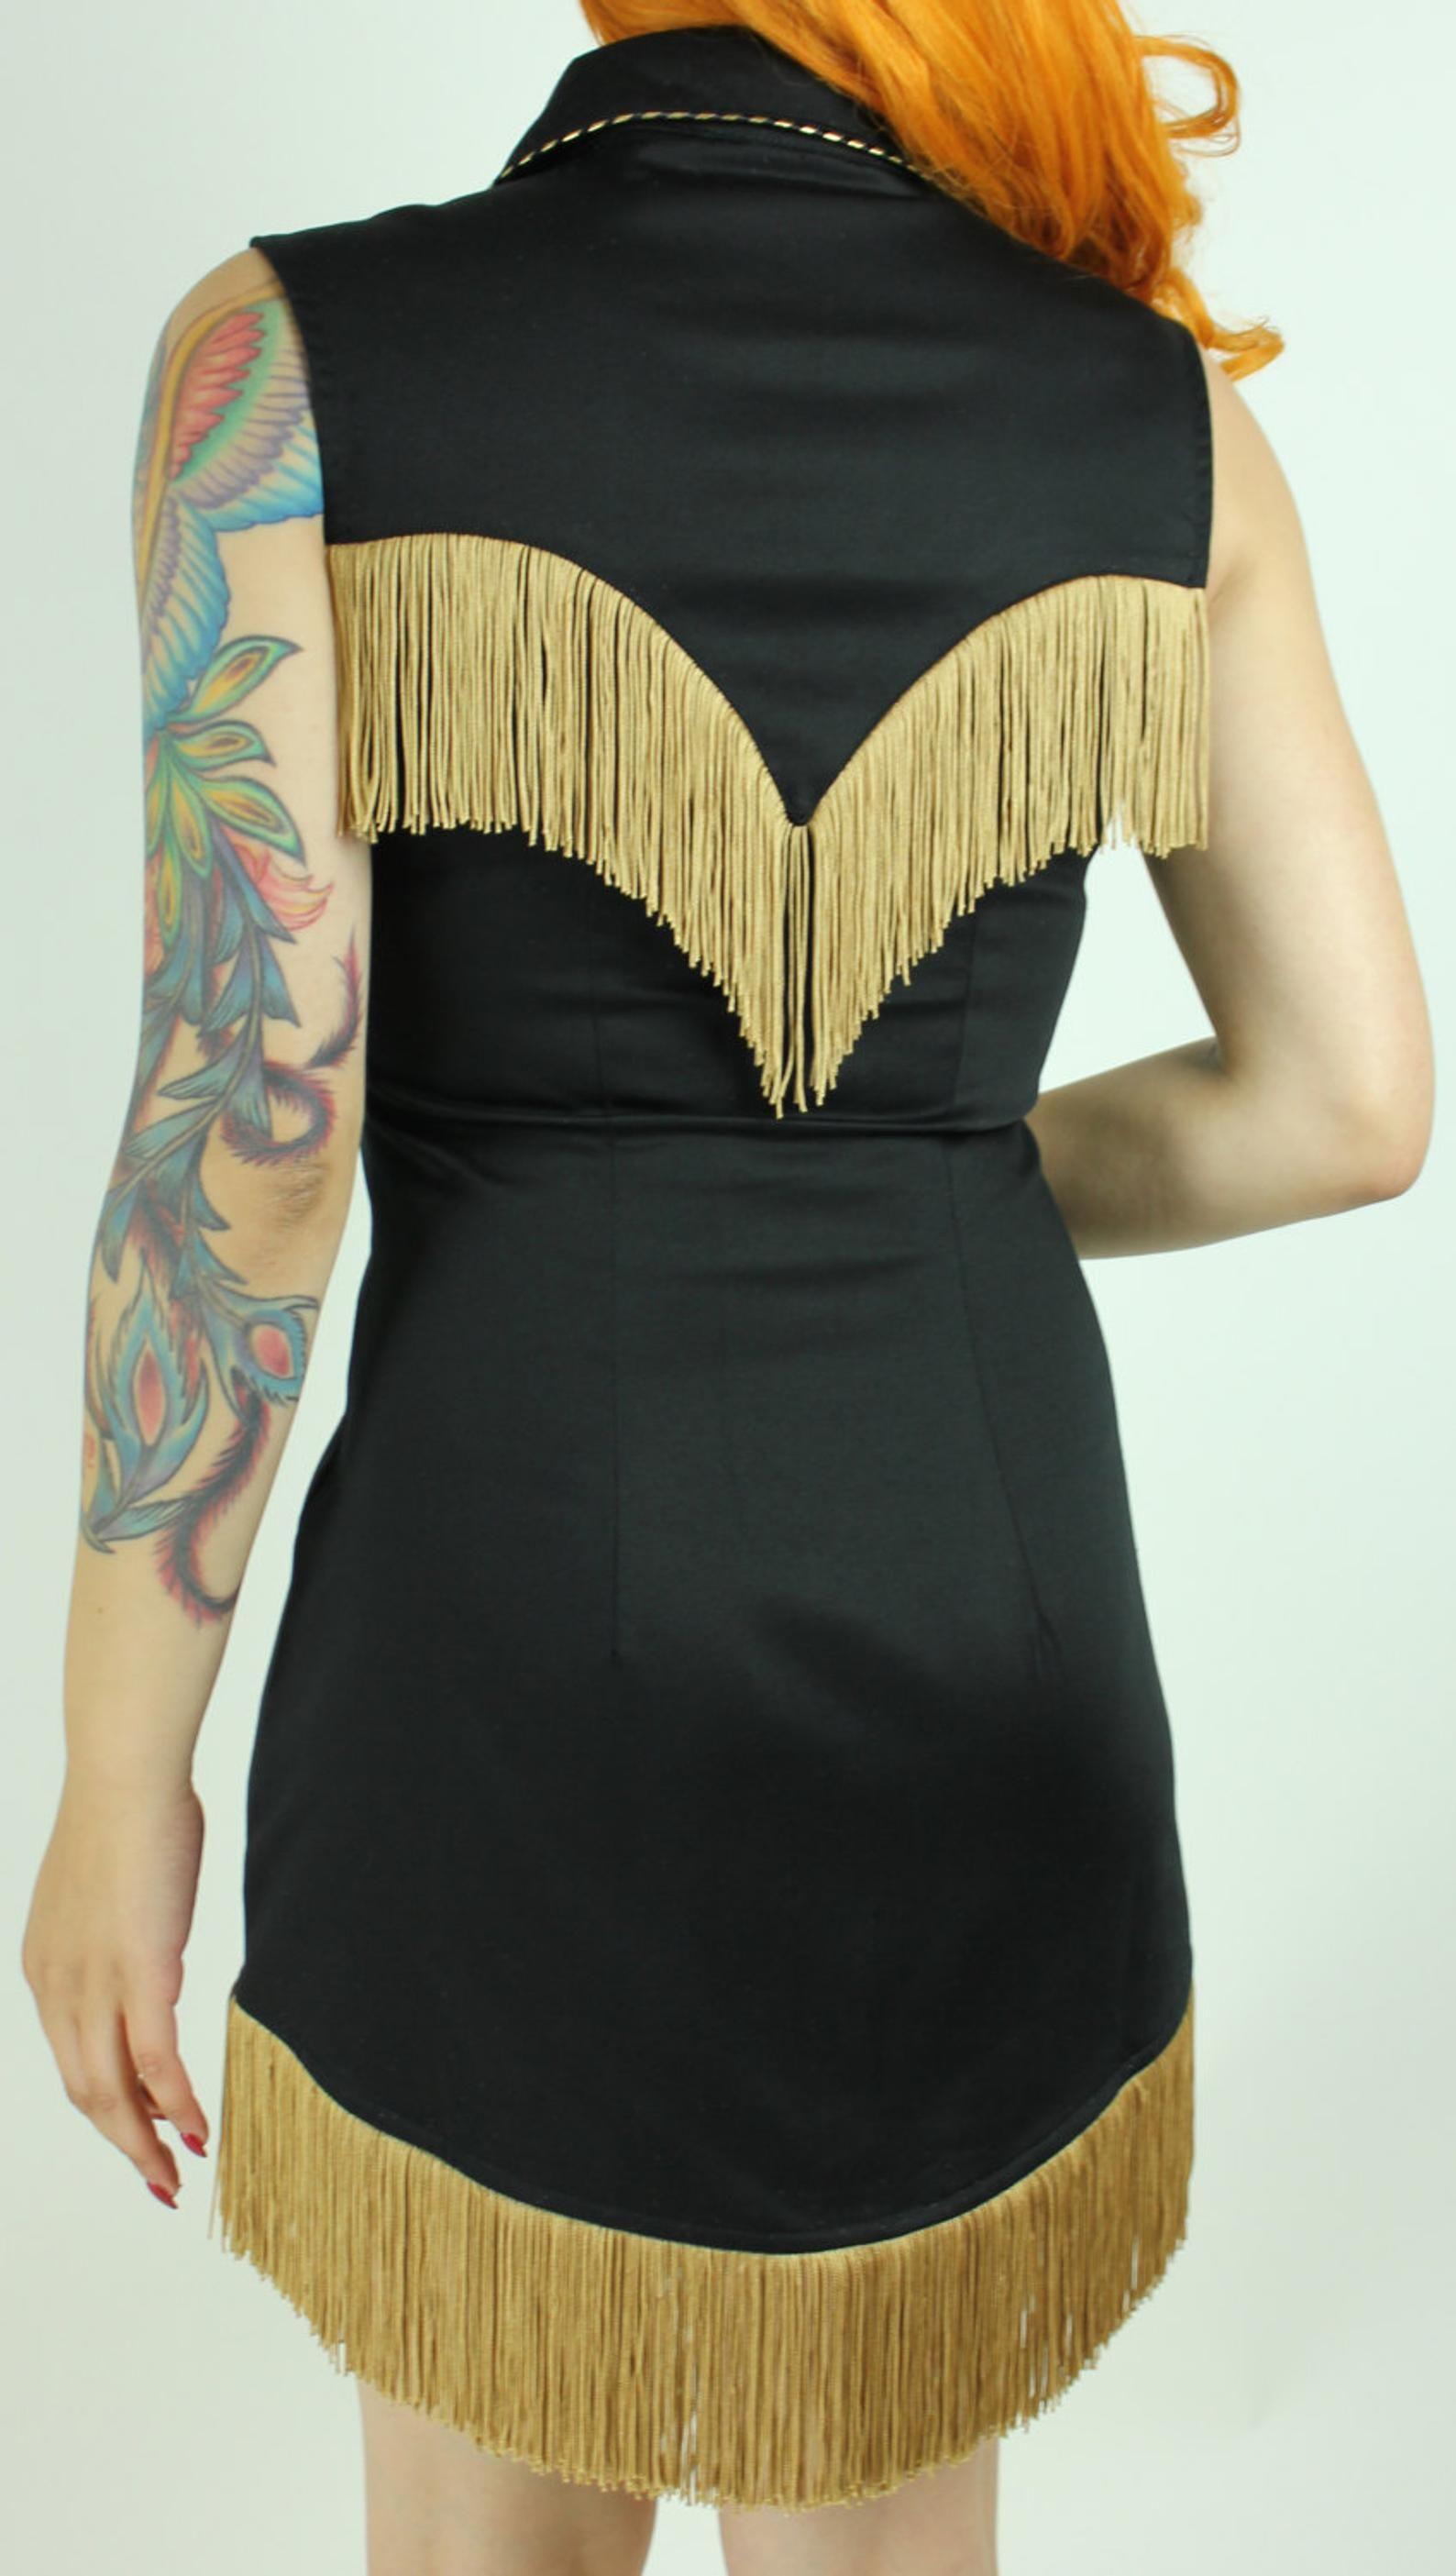 Riley Western Fringe Dress in Black